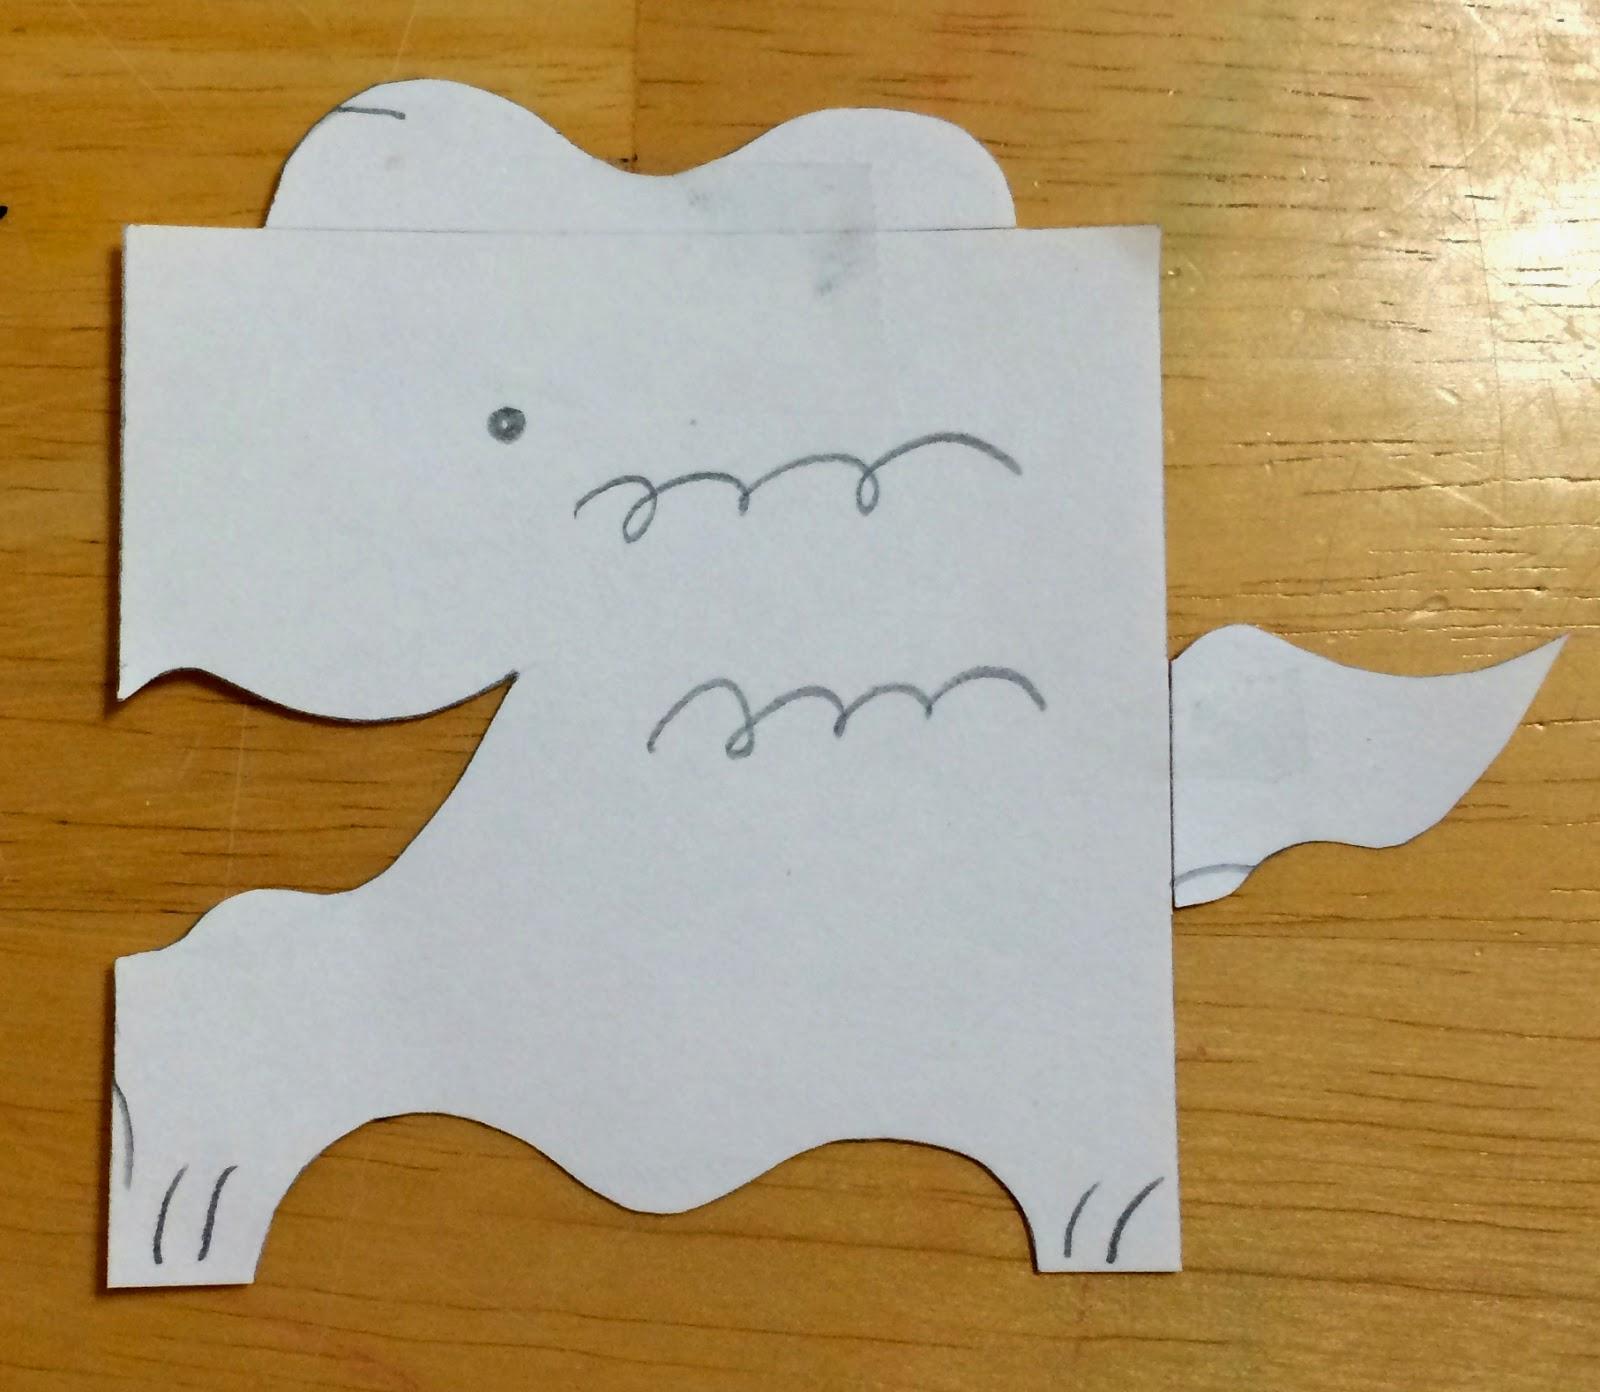 Kathy S Art Project Ideas Imagination Tesselation